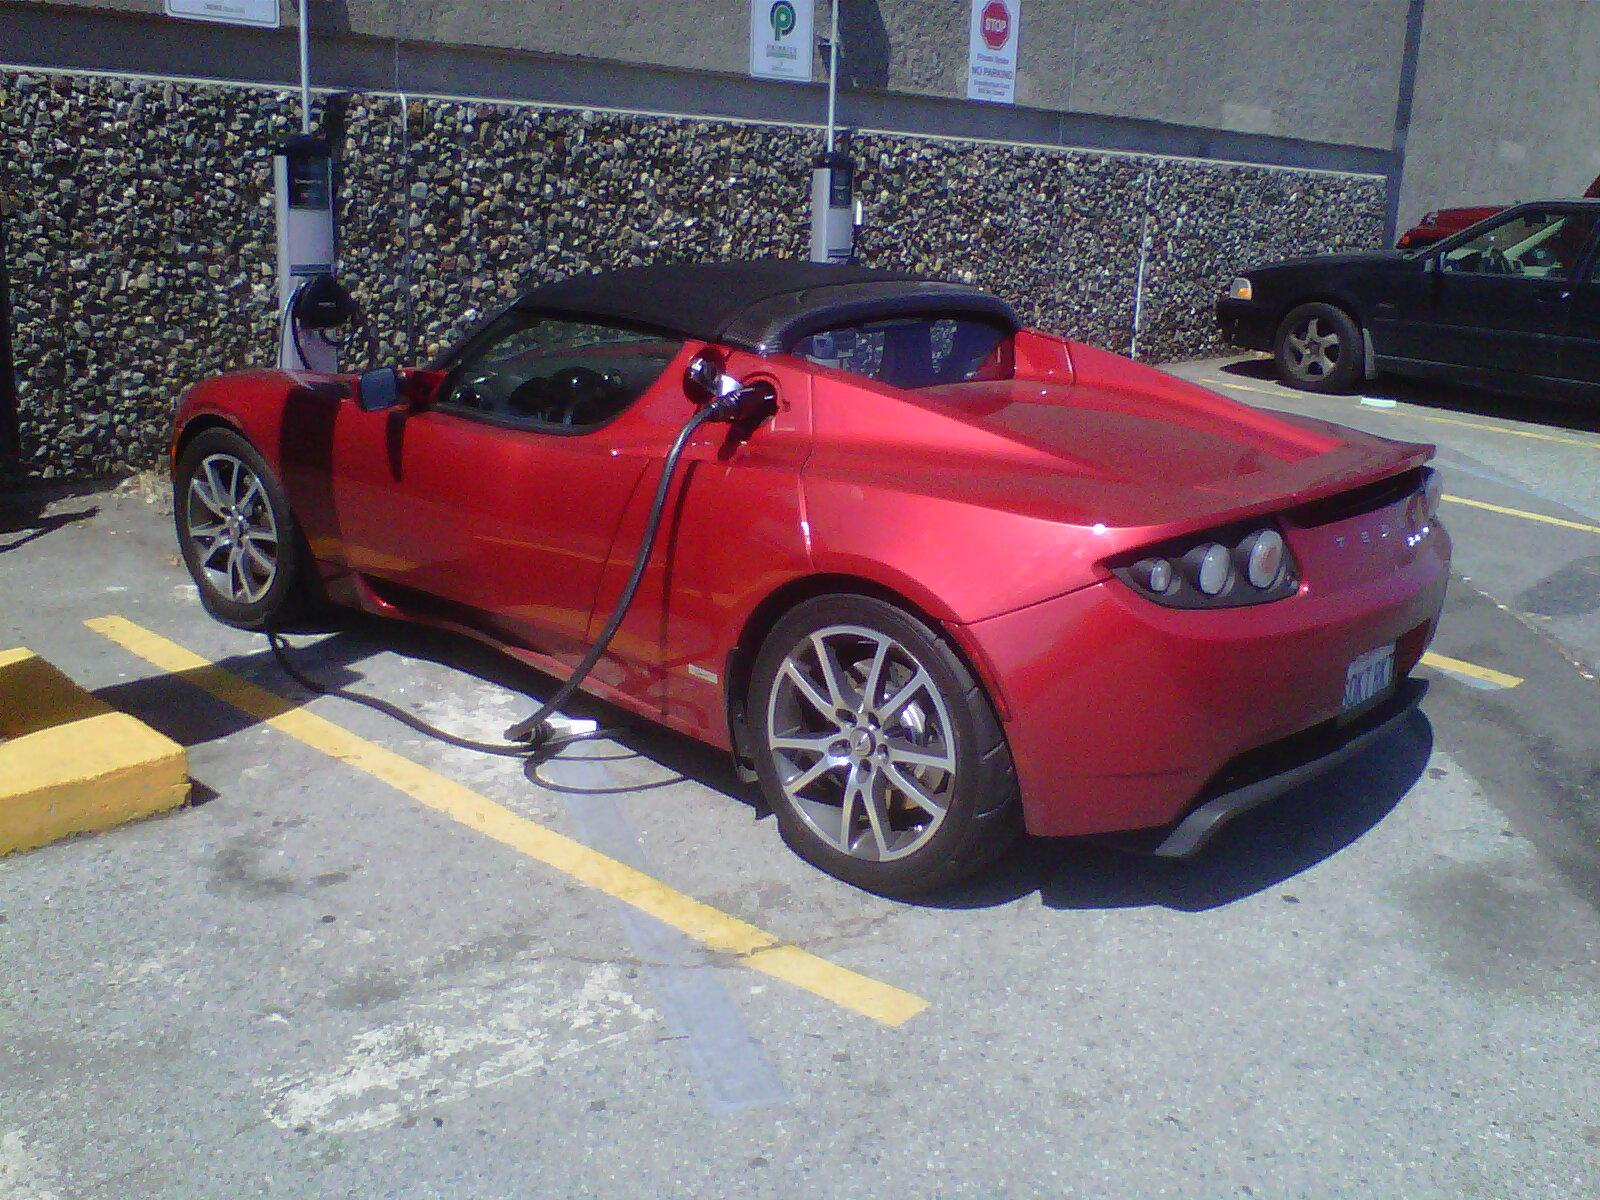 Tesla Roadster Charging in San Francisco. Credit: Author